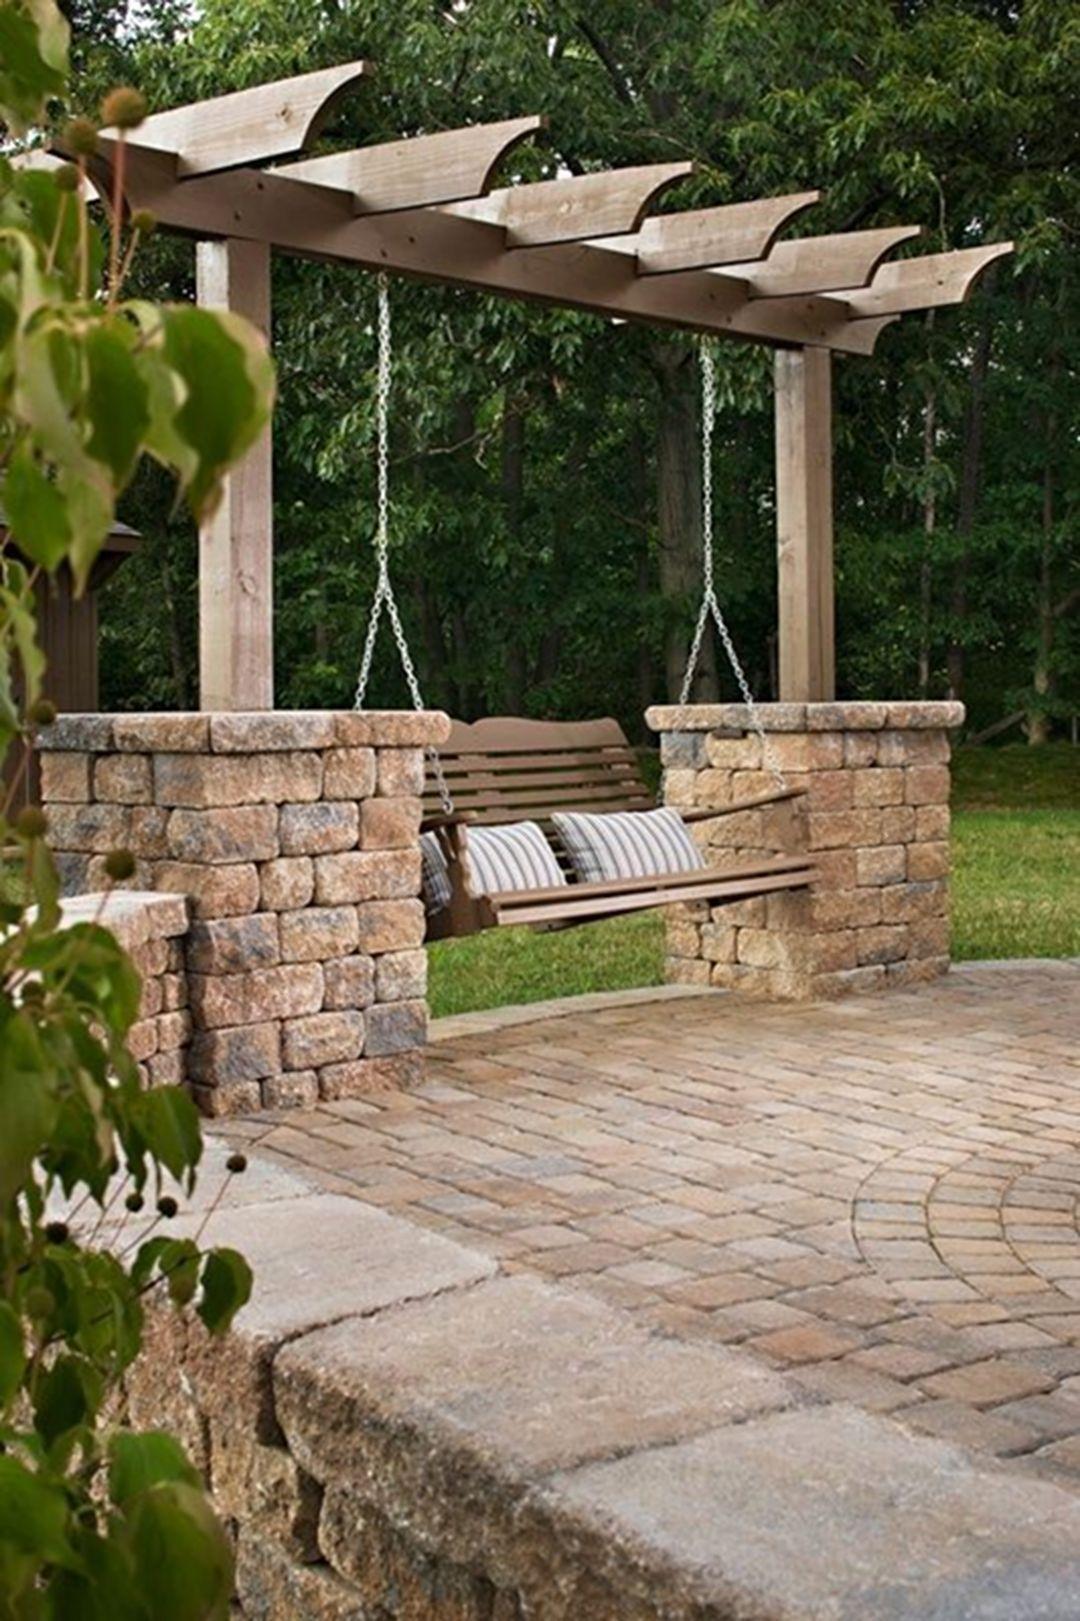 10 Beautiful Backyard Patio Design Ideas For Relax With Your Family #beautifulbackyards